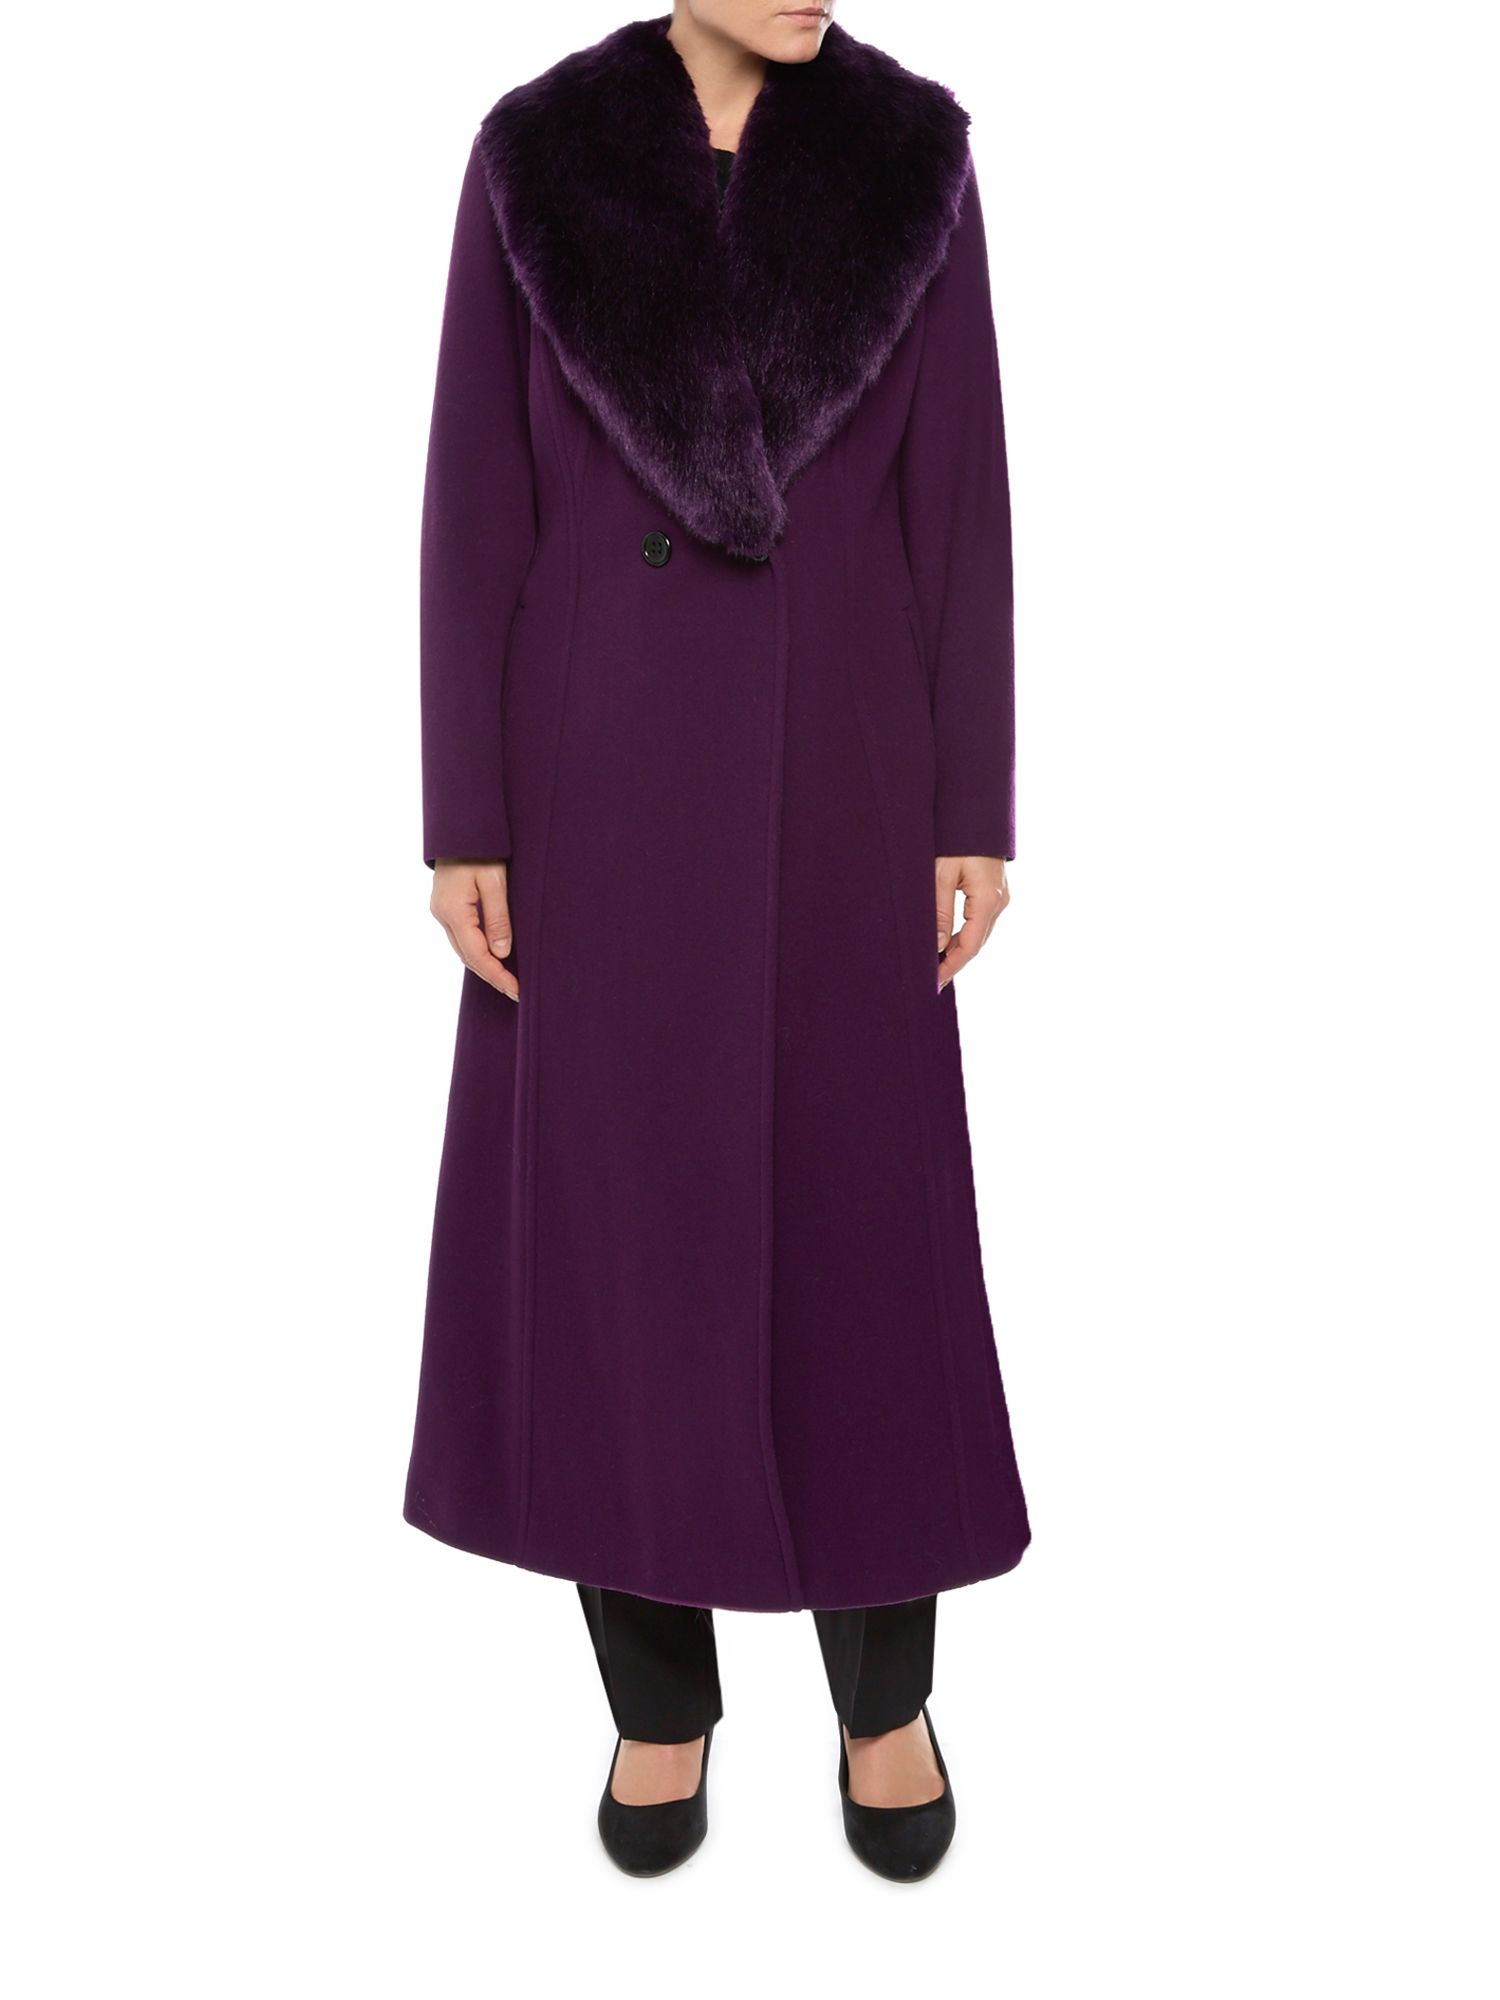 Jacques vert Long Fur Collar Coat in Purple | Lyst